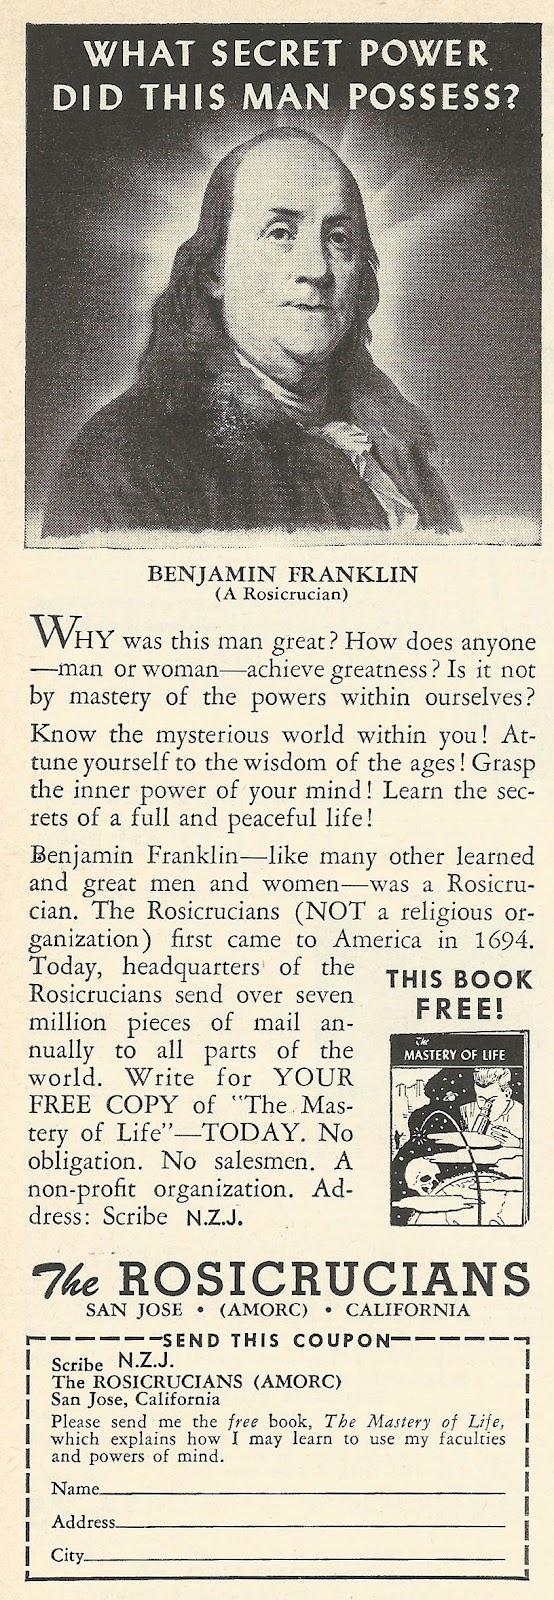 1962 ad: What Secret Power did Benjamin Franklin (a Rosicrucian) Possess?